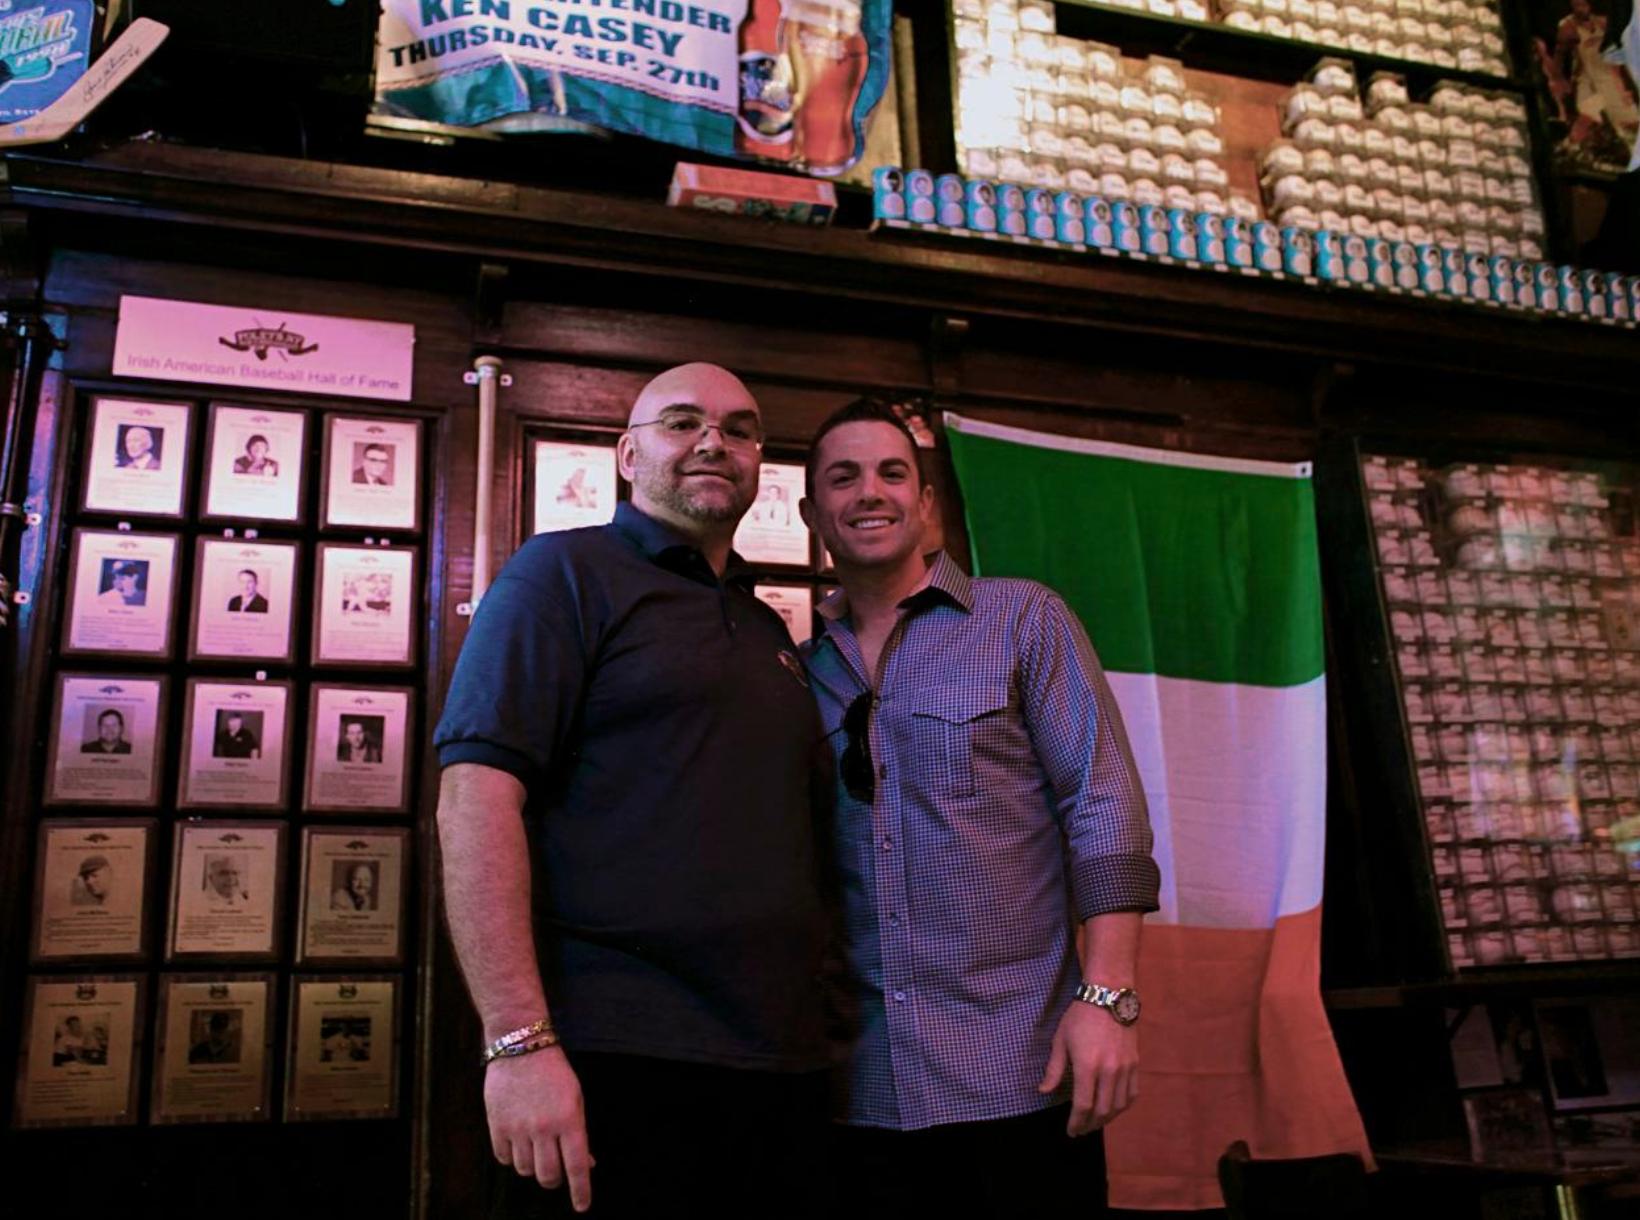 Shaun Clancy and David Wright